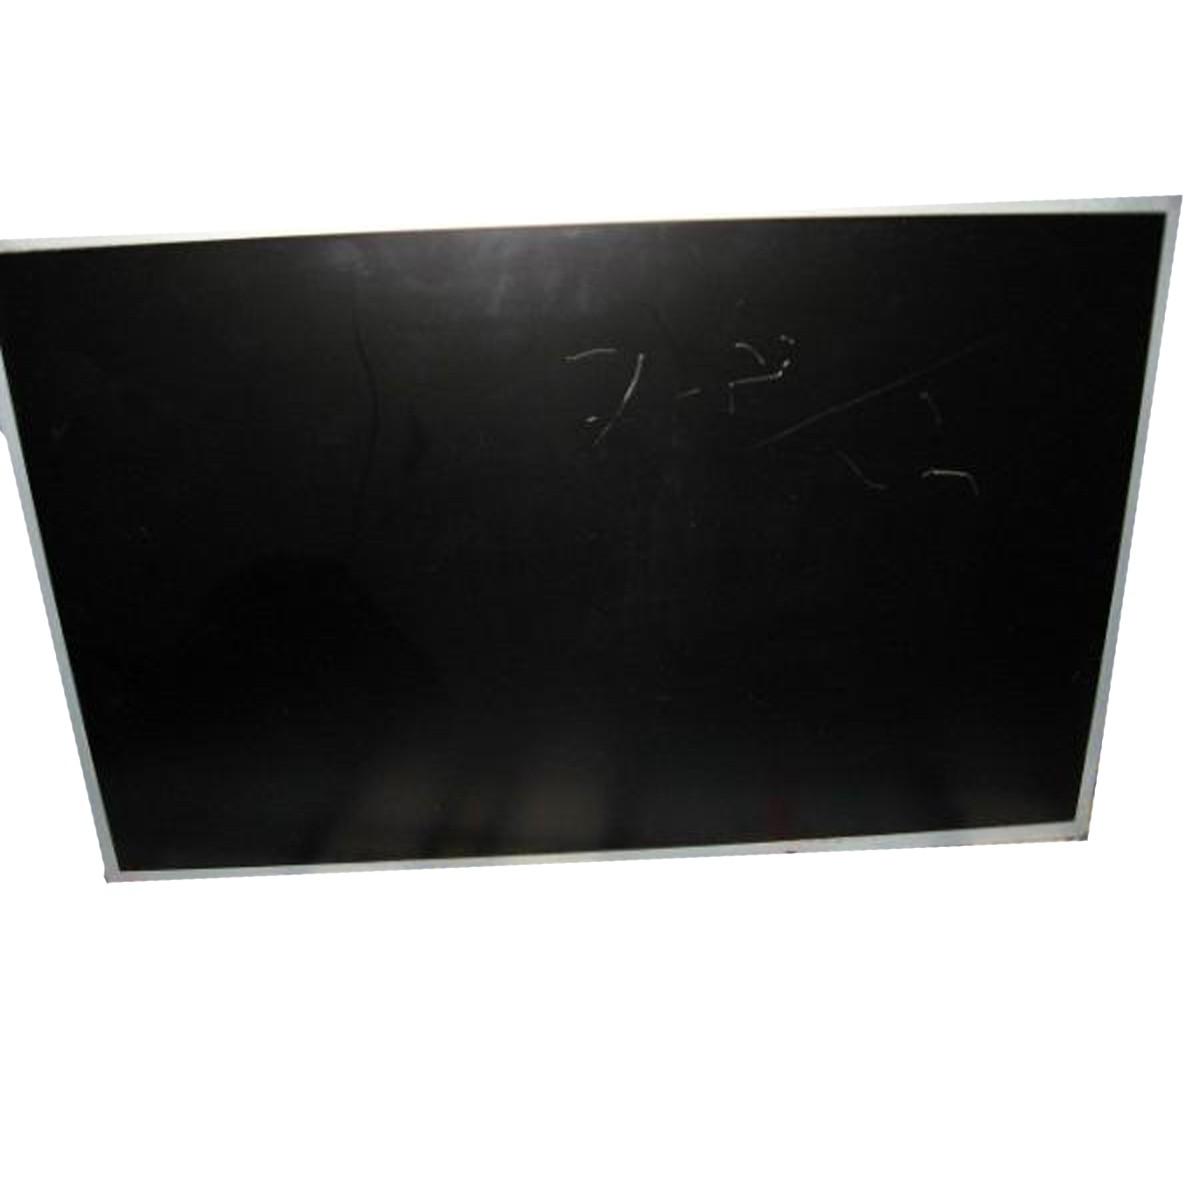 Tela Display LCD Monitor LG W2284ft PN:LM220WE1 - Retirado